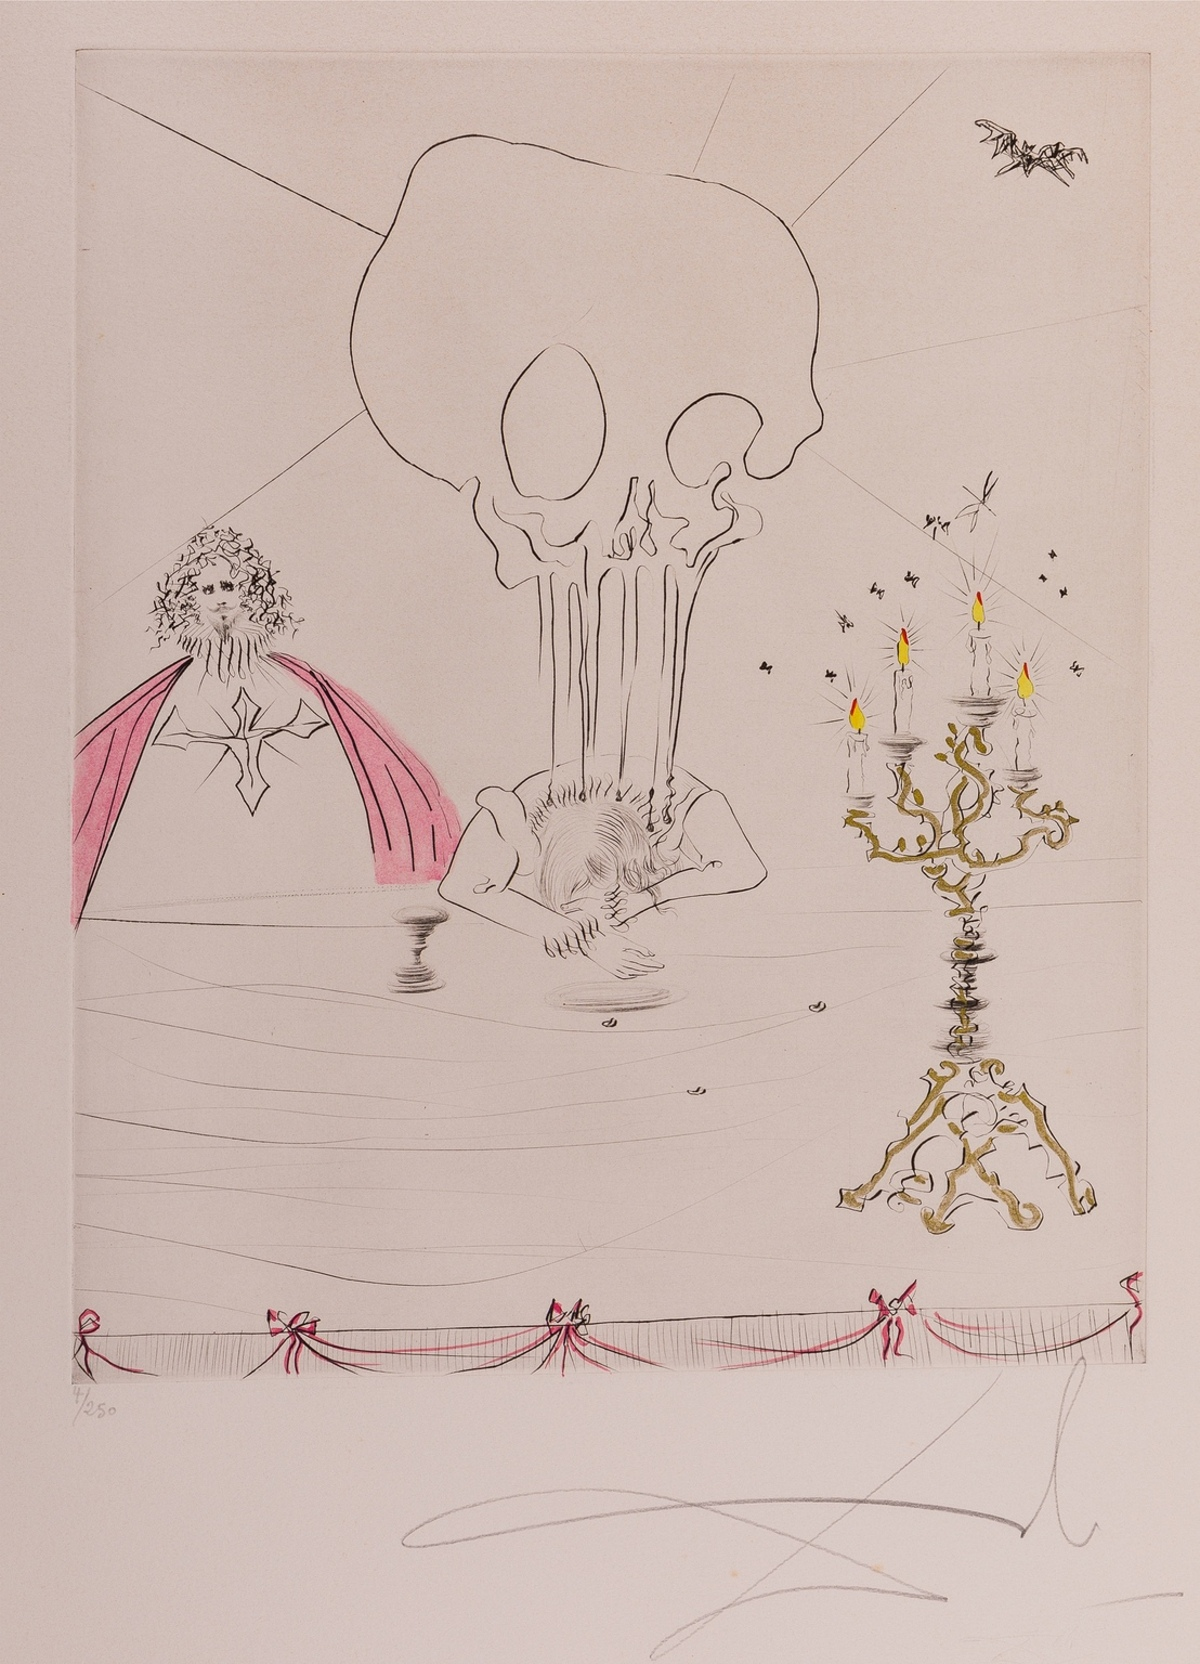 Salvador Dalí (1904-1989) Don Juan. Le Banquet (Field 70-6-B)